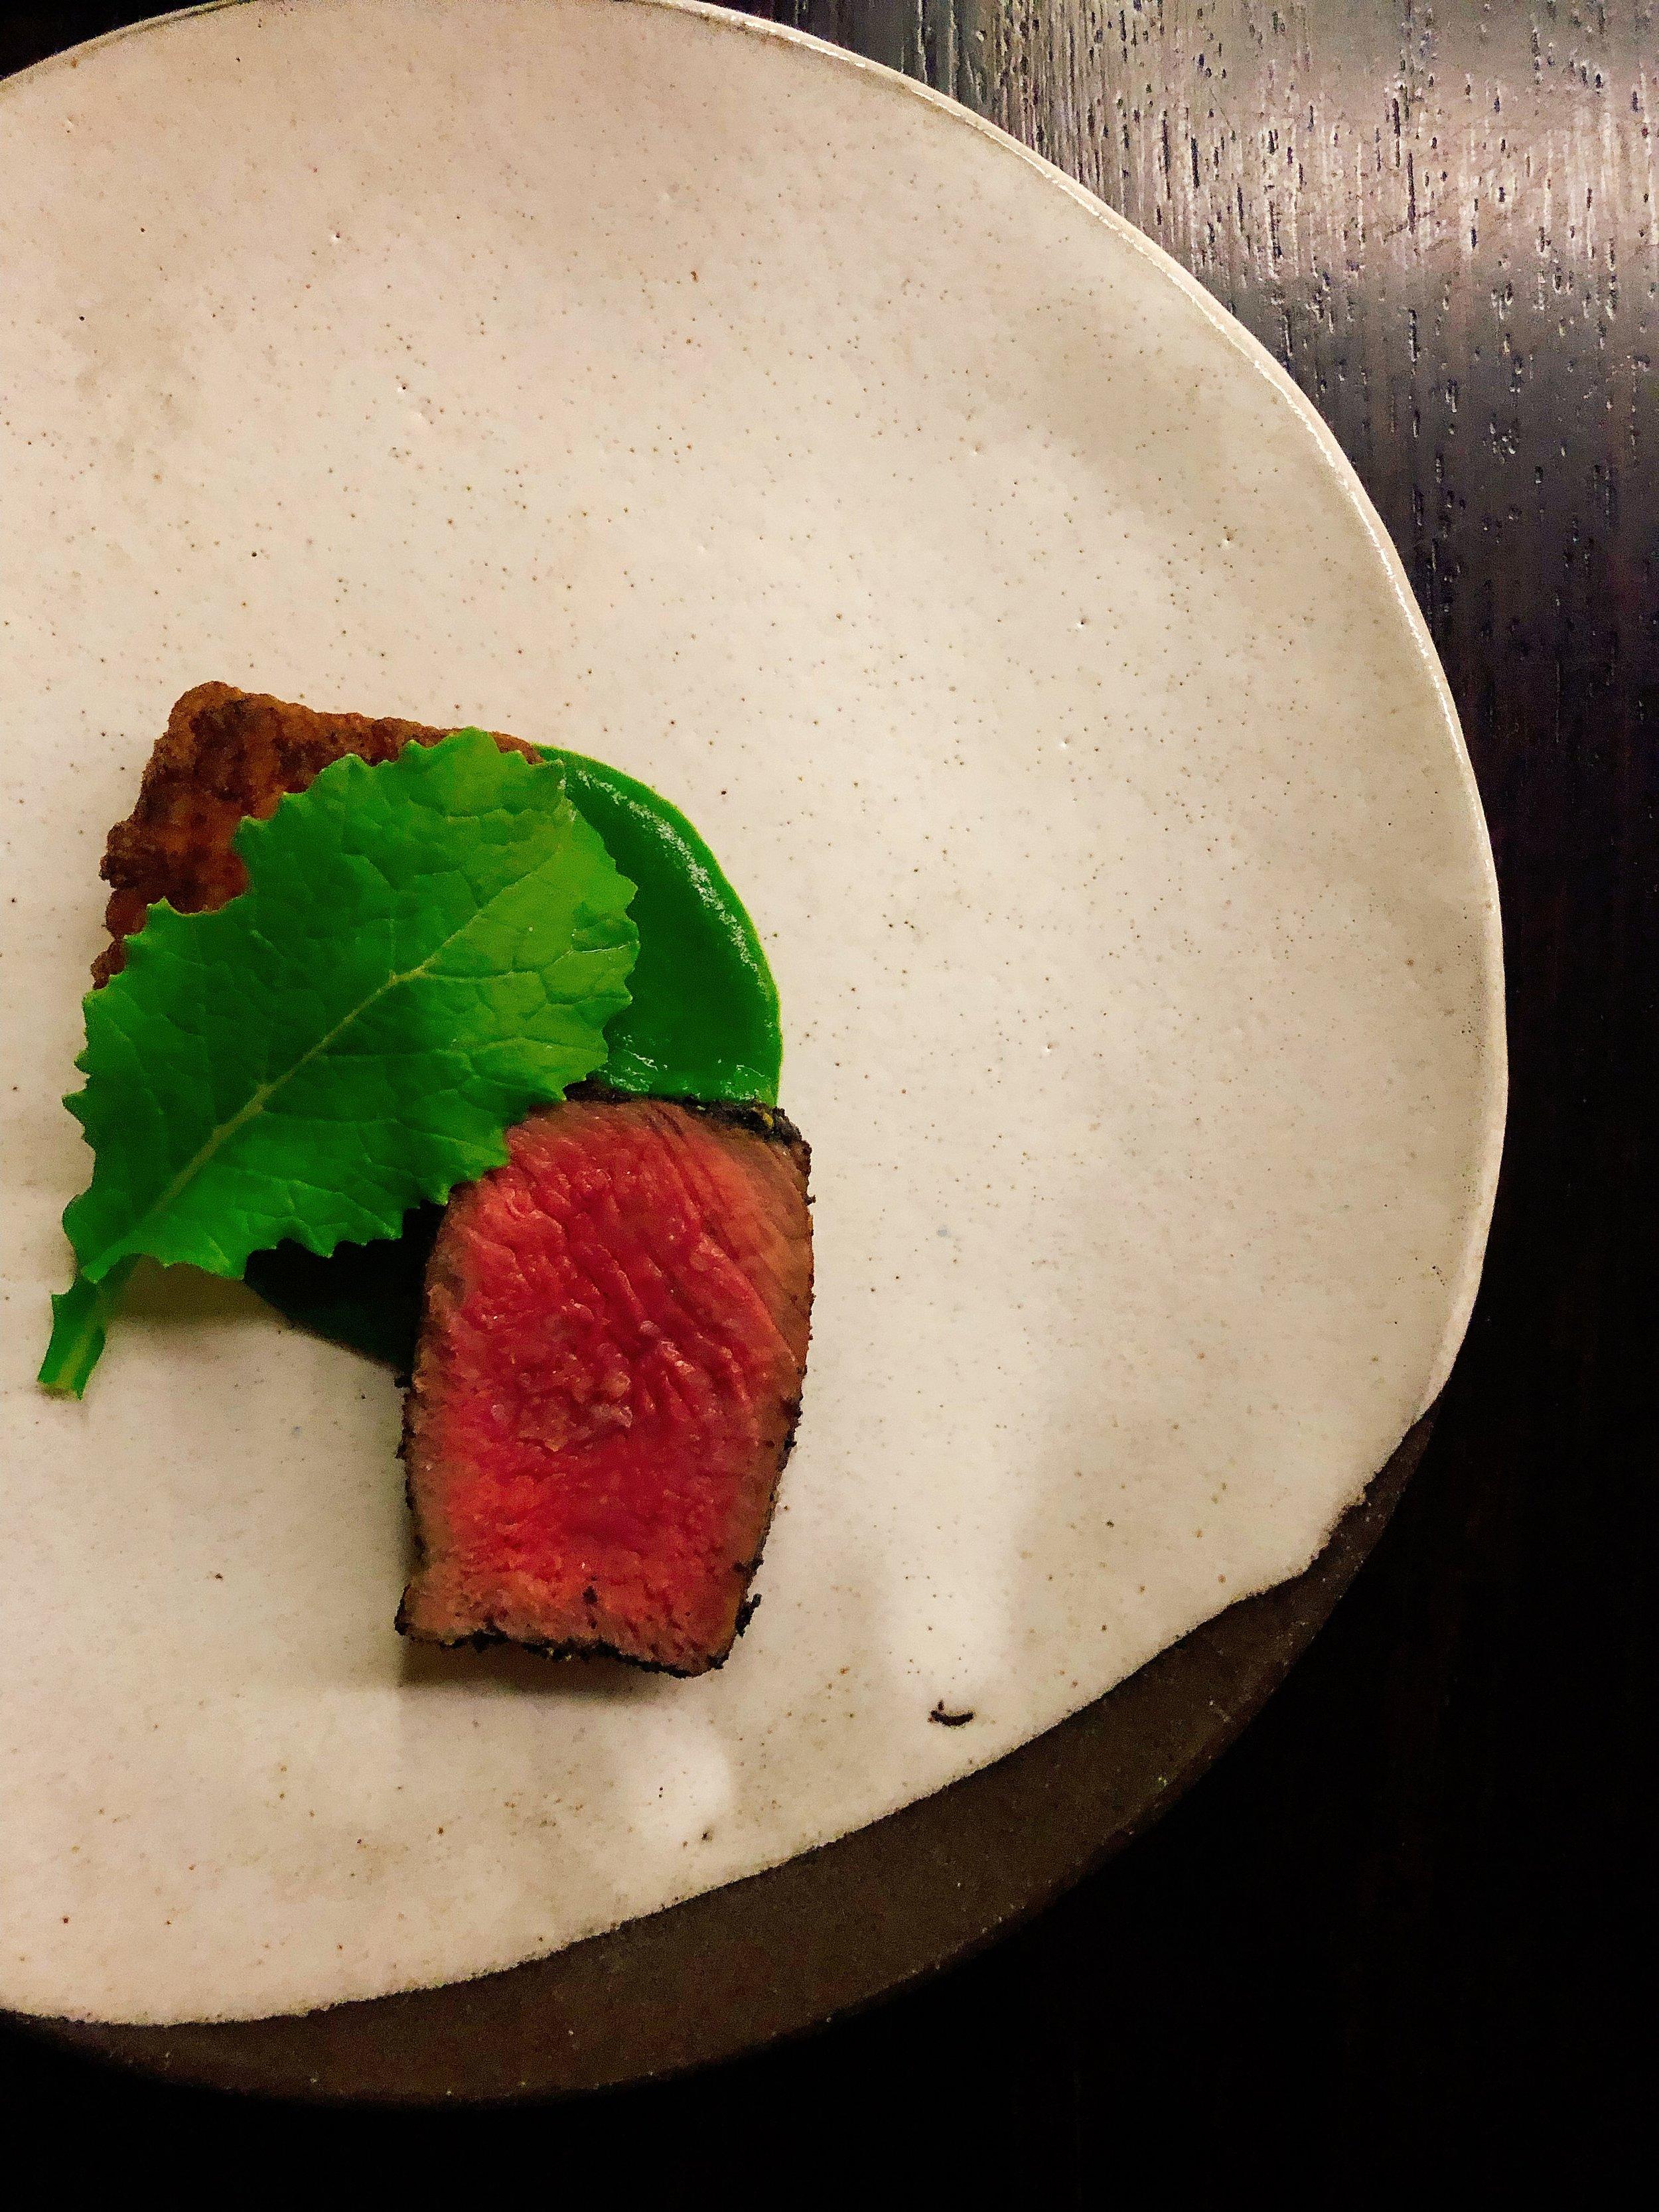 Bearcreek Farm 30 Day Aged Strip Loin In Umami Crust + Catbird Kimchi Fried Rice + Scallion Purèe